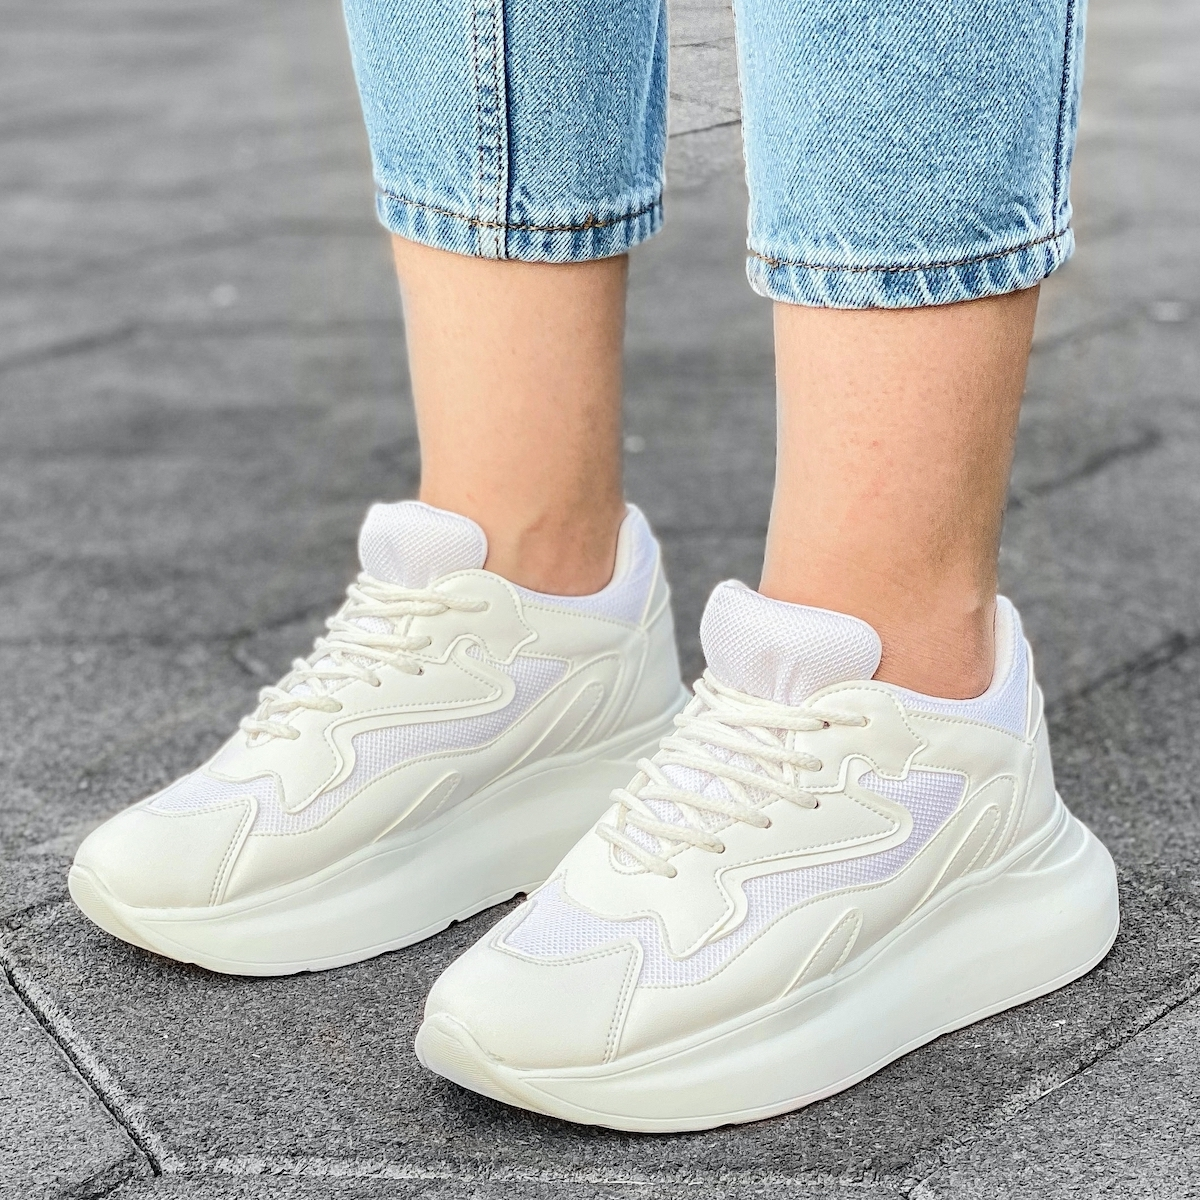 Women's High Sole Sneakers In White